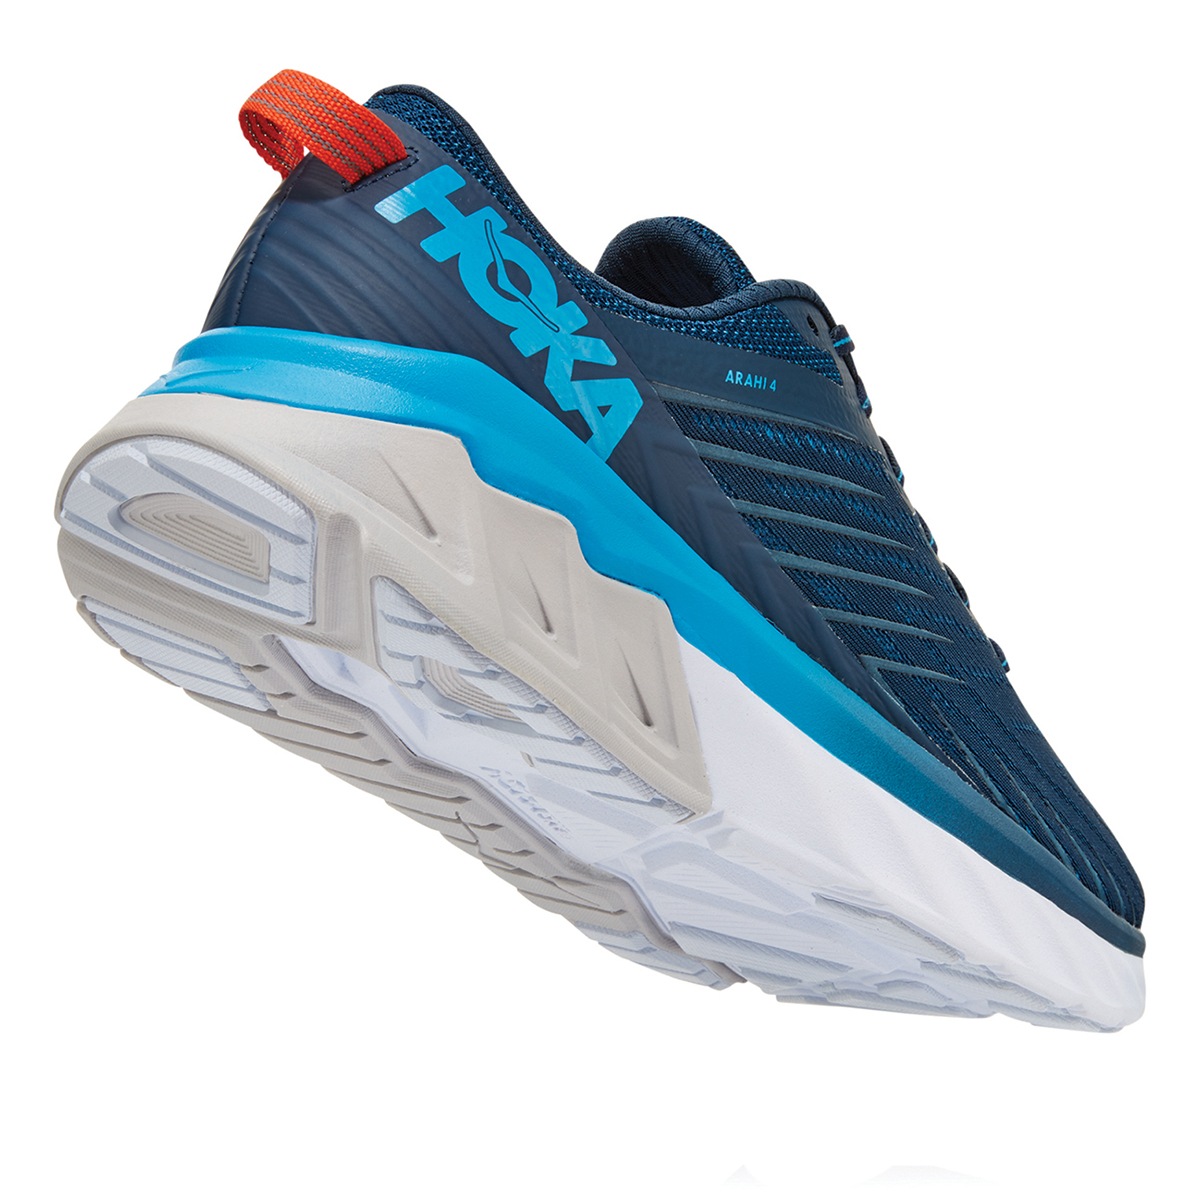 Men's Hoka One One Arahi 4 Running Shoe - Color: Majolica Blue/Dresden Blue (Regular Width) - Size: 7, Majolica Blue/Dresden Blue, large, image 4